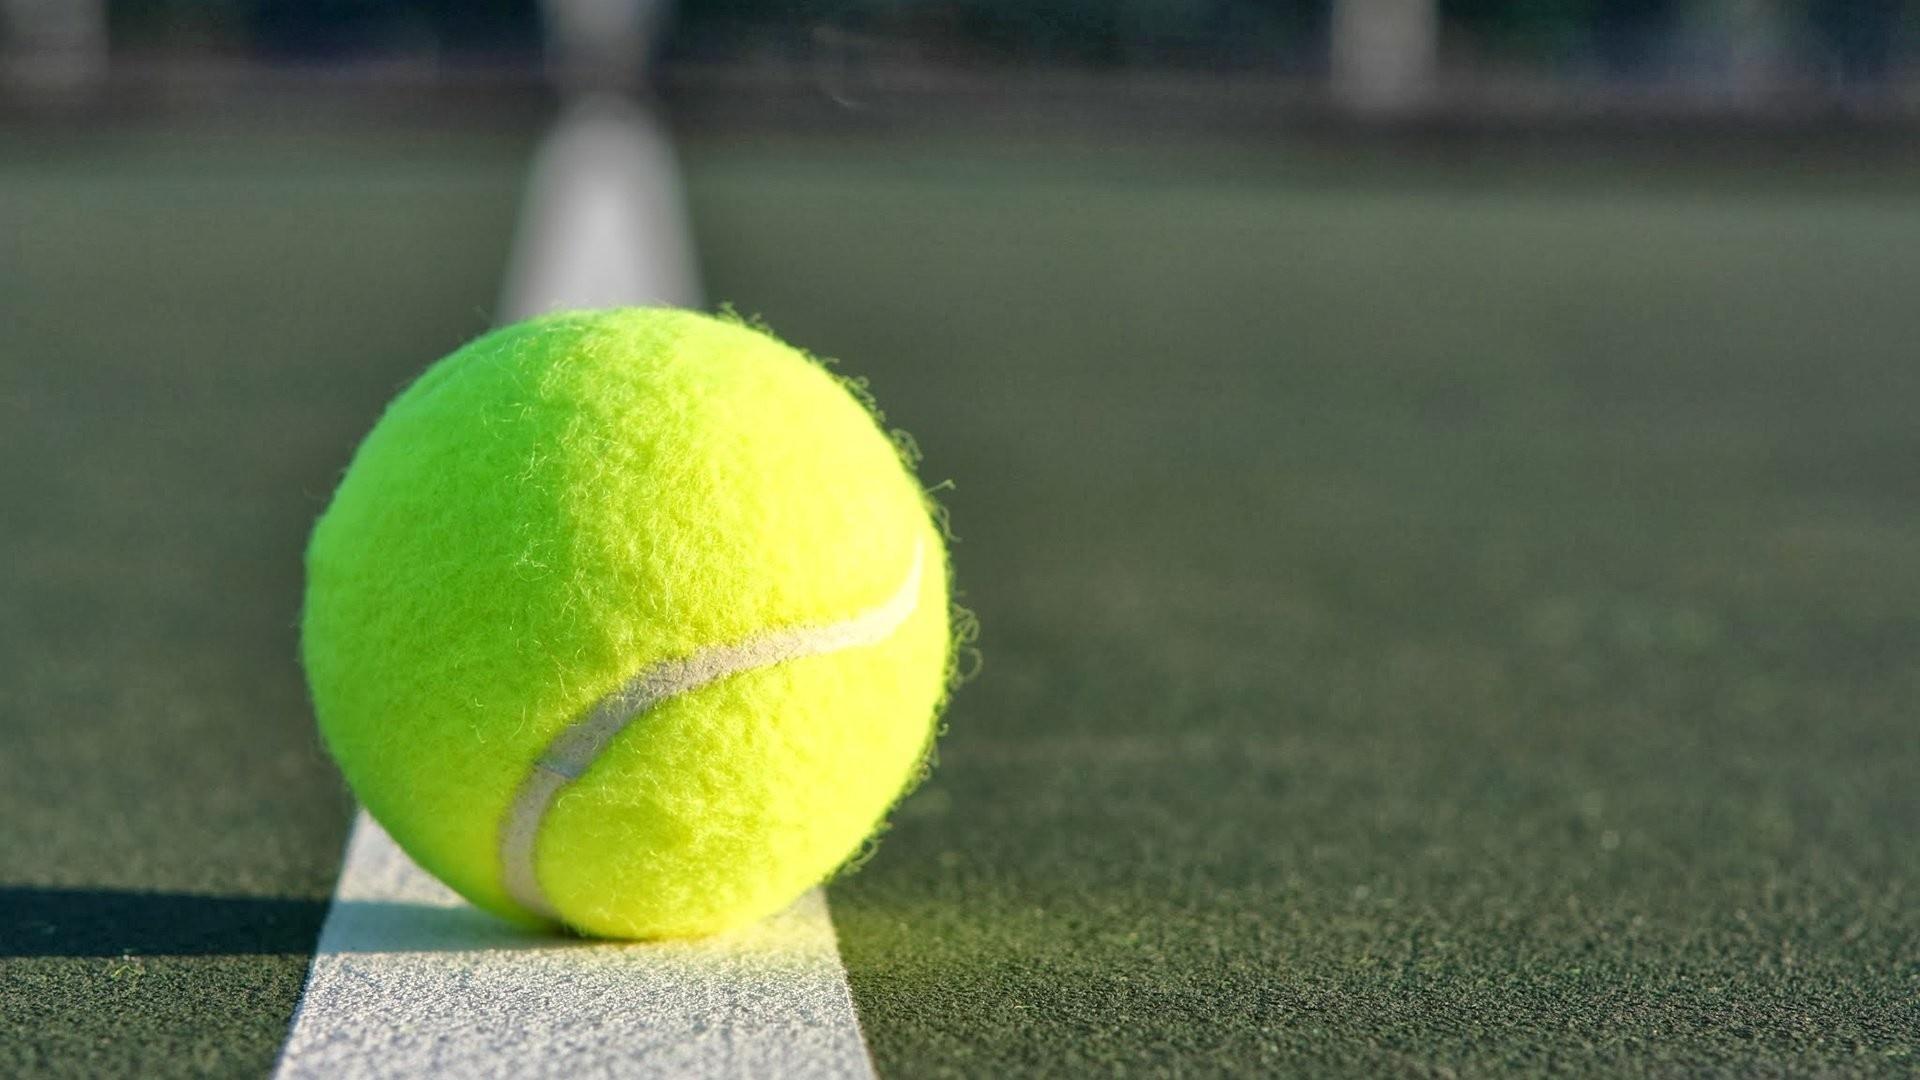 Tennis Ball hd background